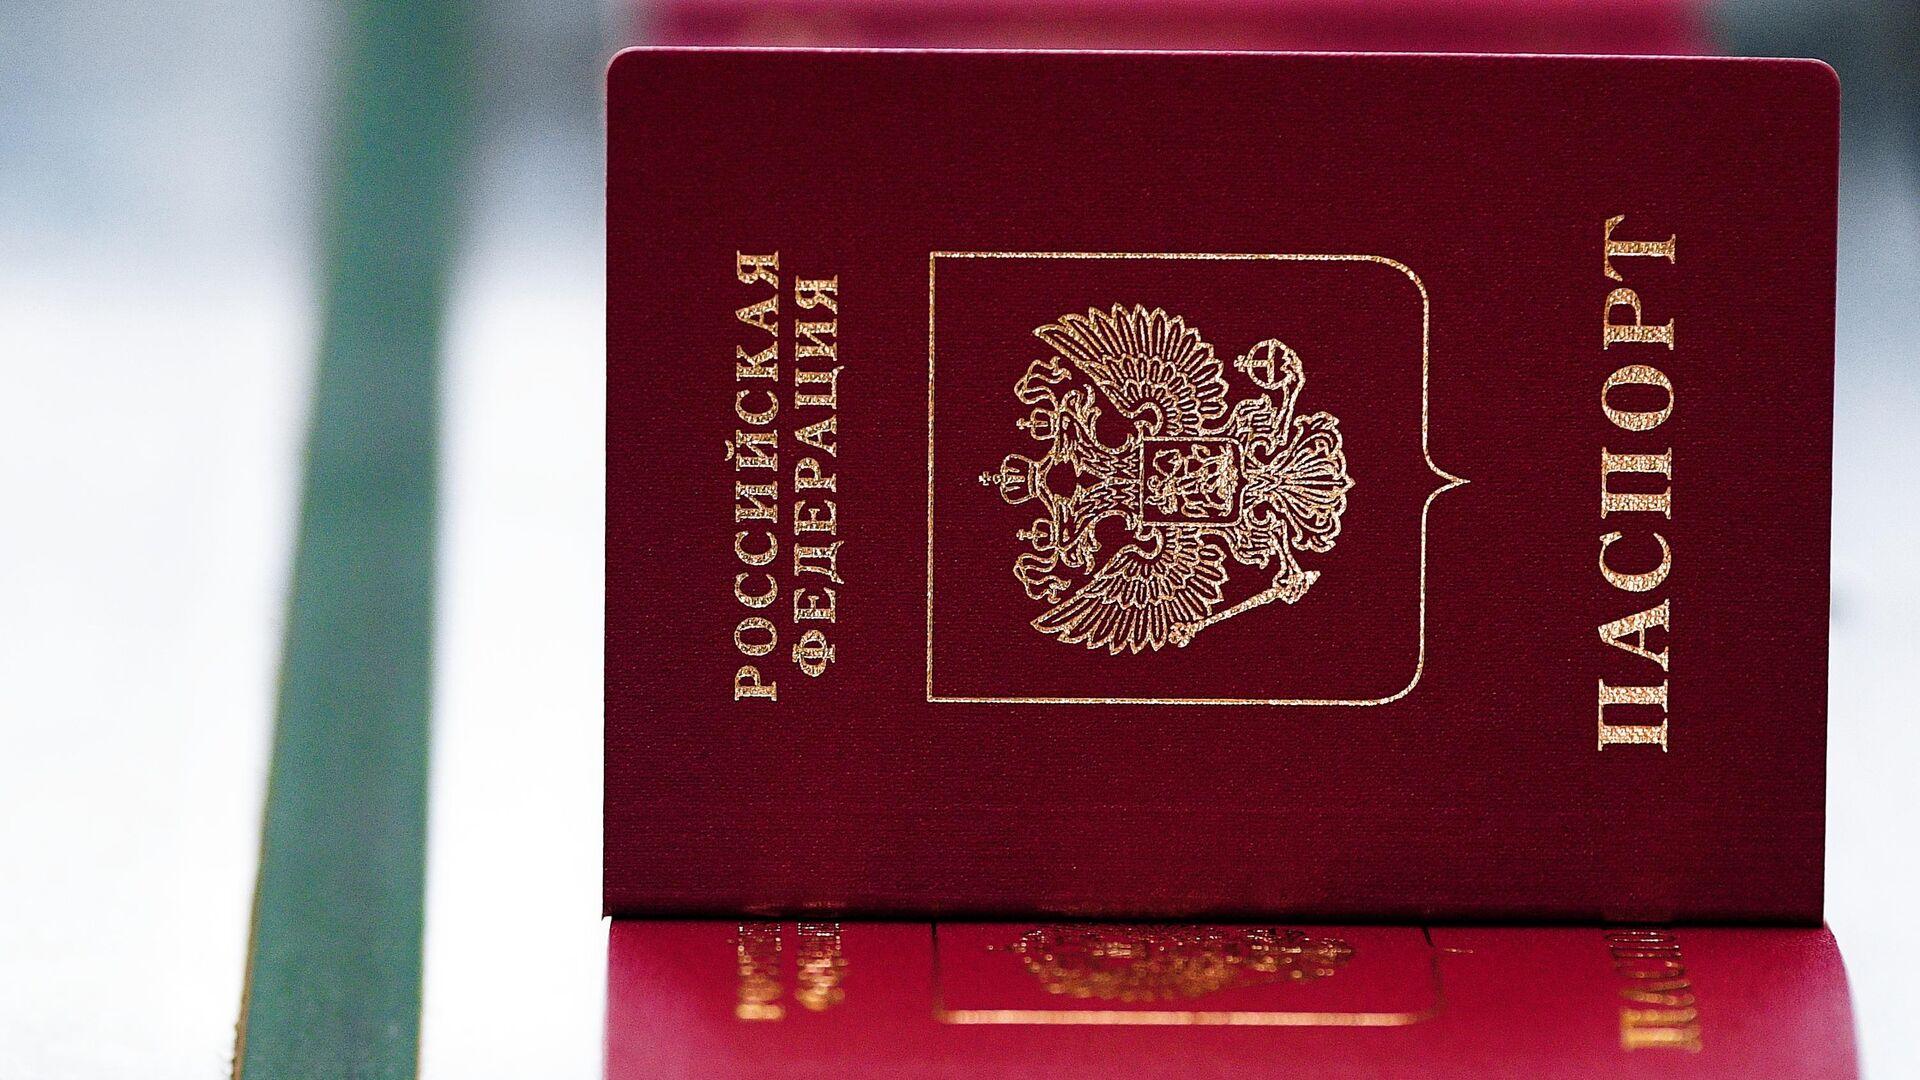 Паспорта РФ  - РИА Новости, 1920, 29.09.2021